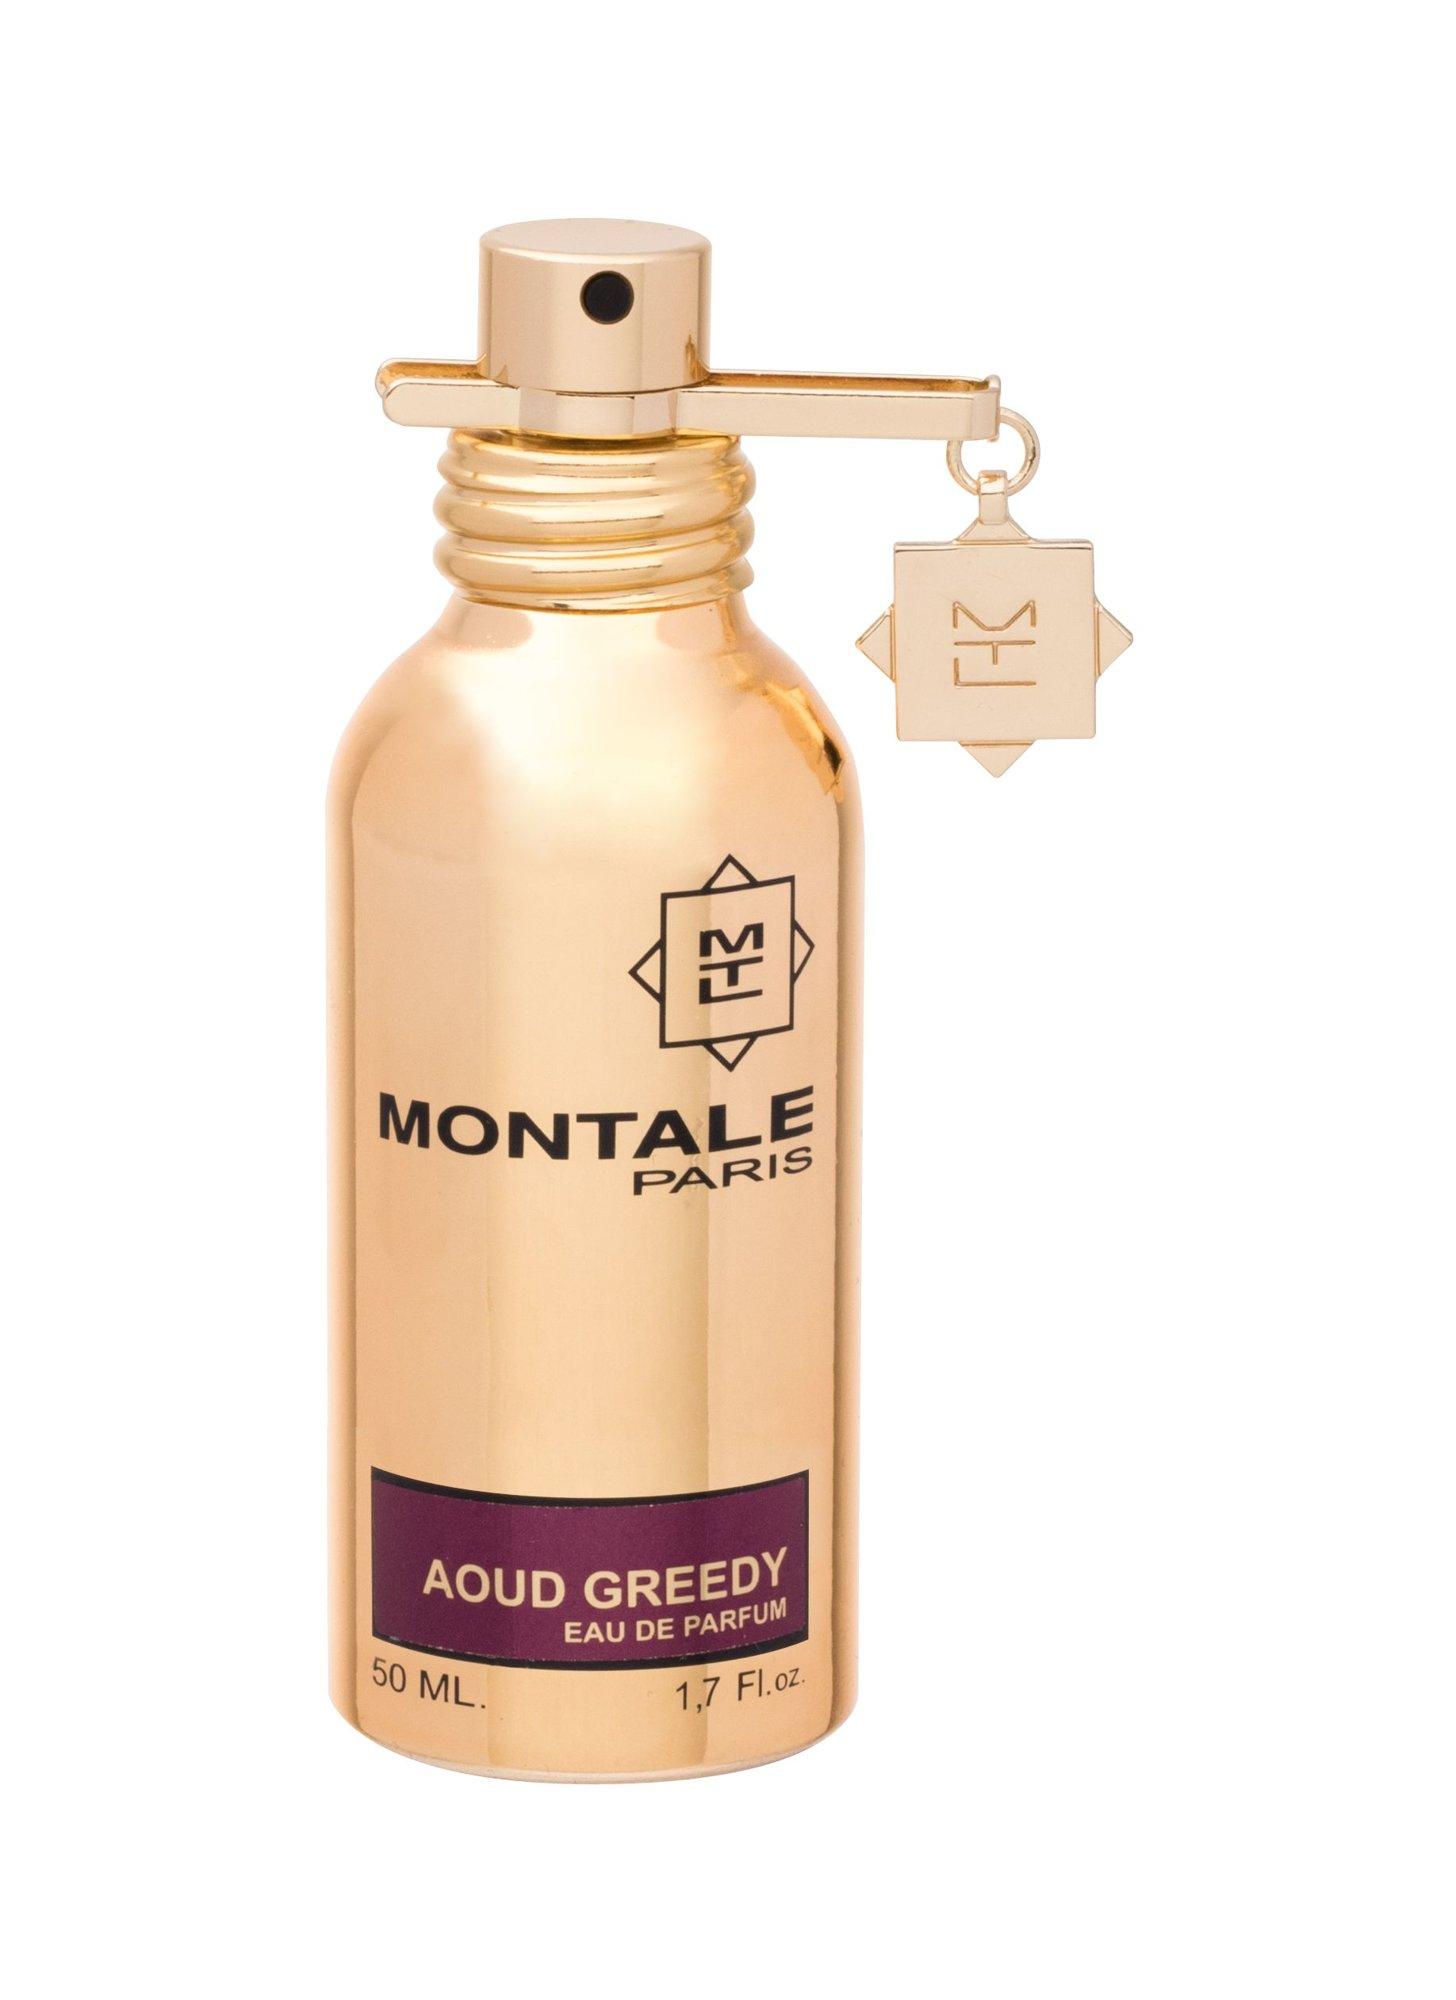 Montale Paris Aoud Greedy EDP 50ml